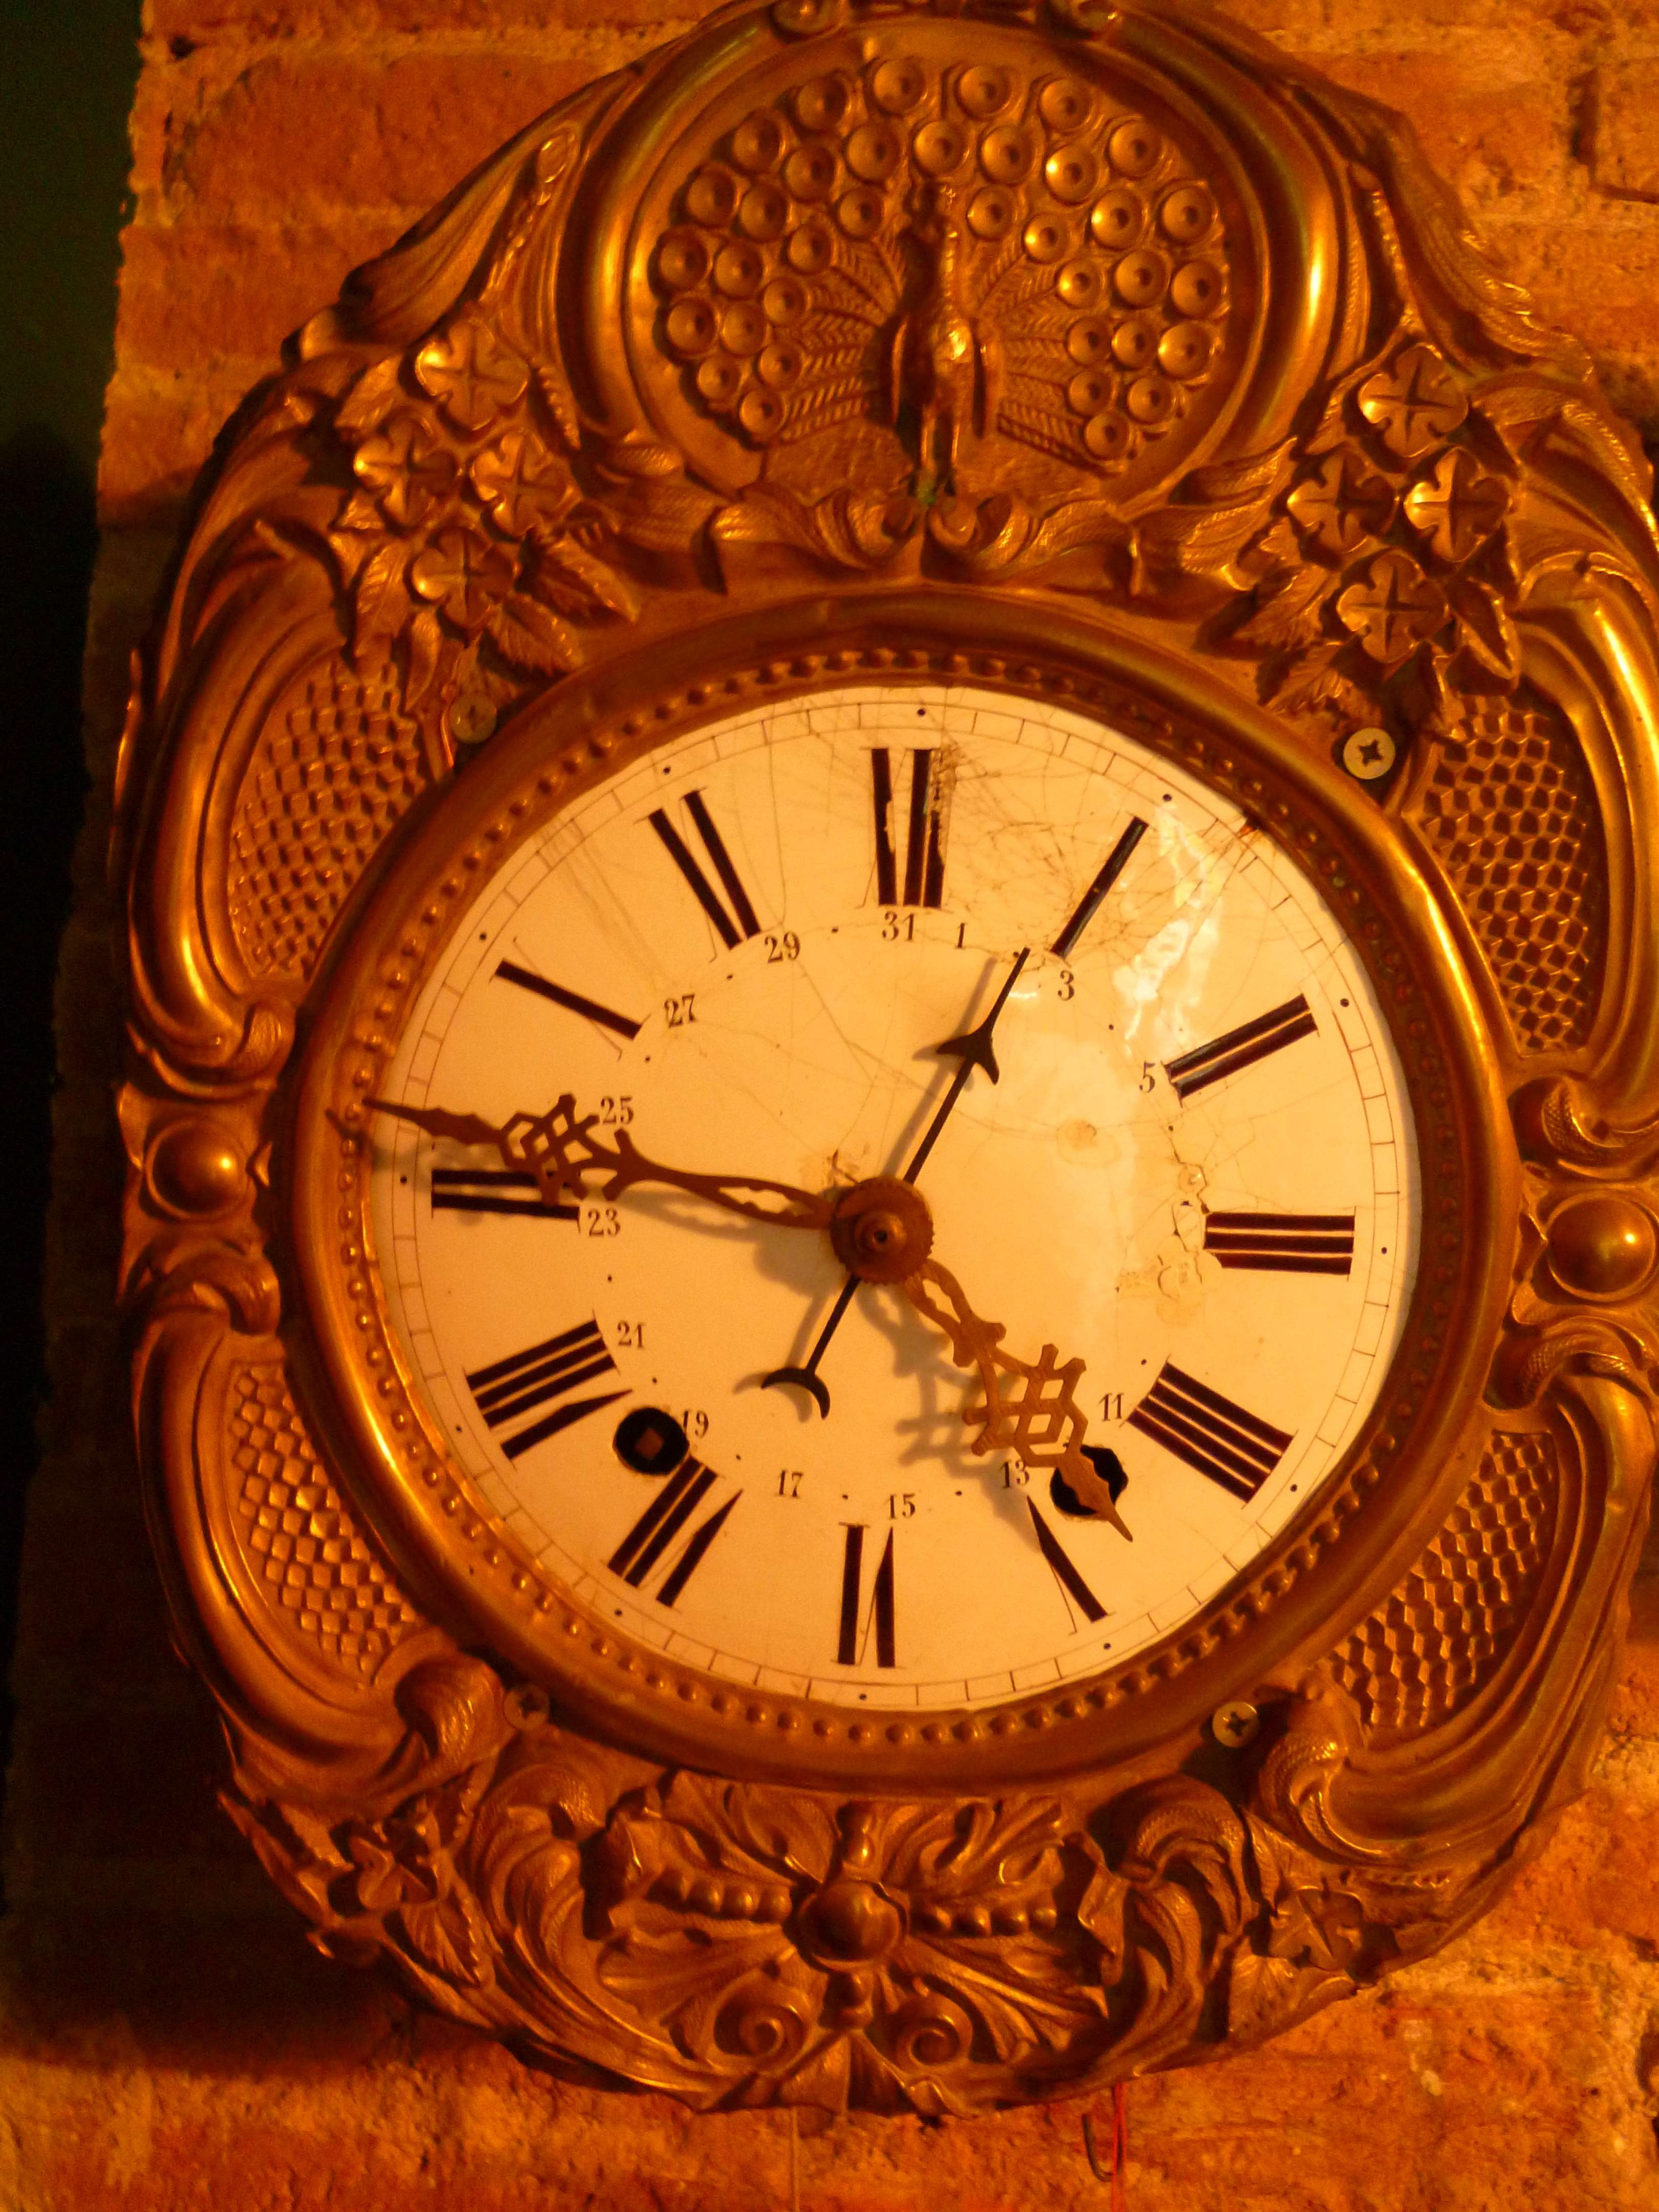 Relojes de pared antiguos | Mobiliario & Interiorismo